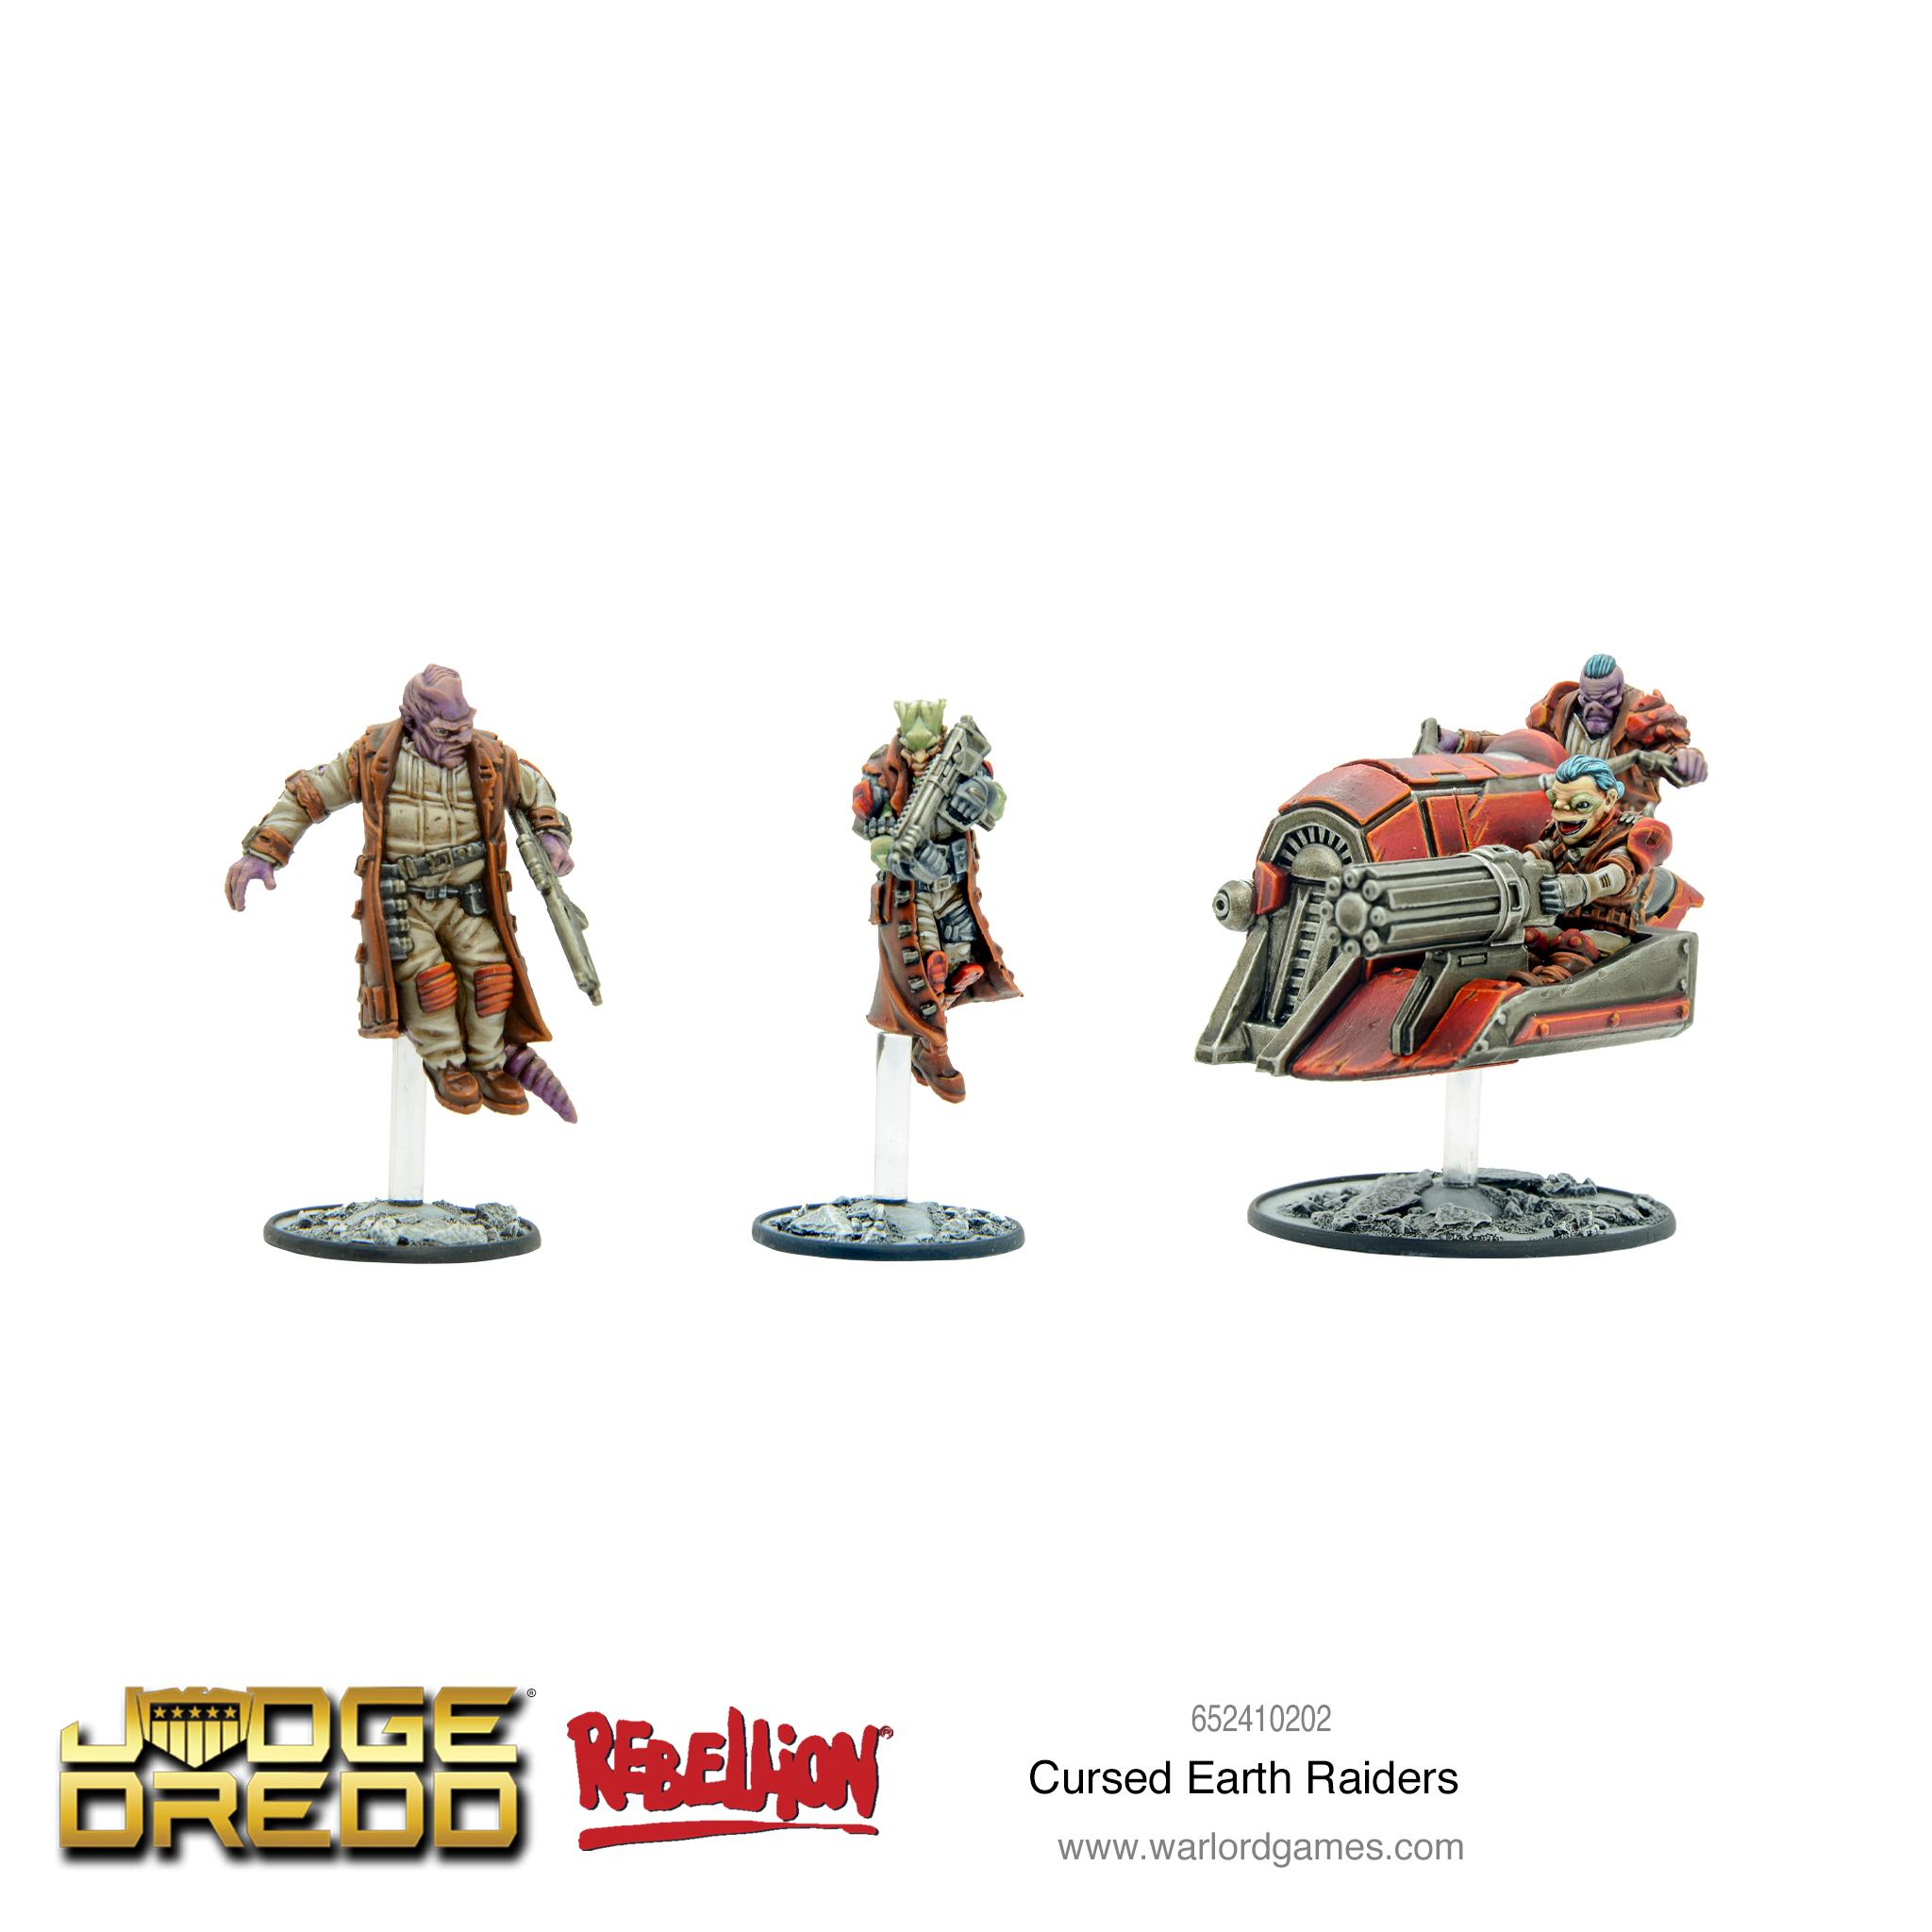 Cursed Earth Raiders